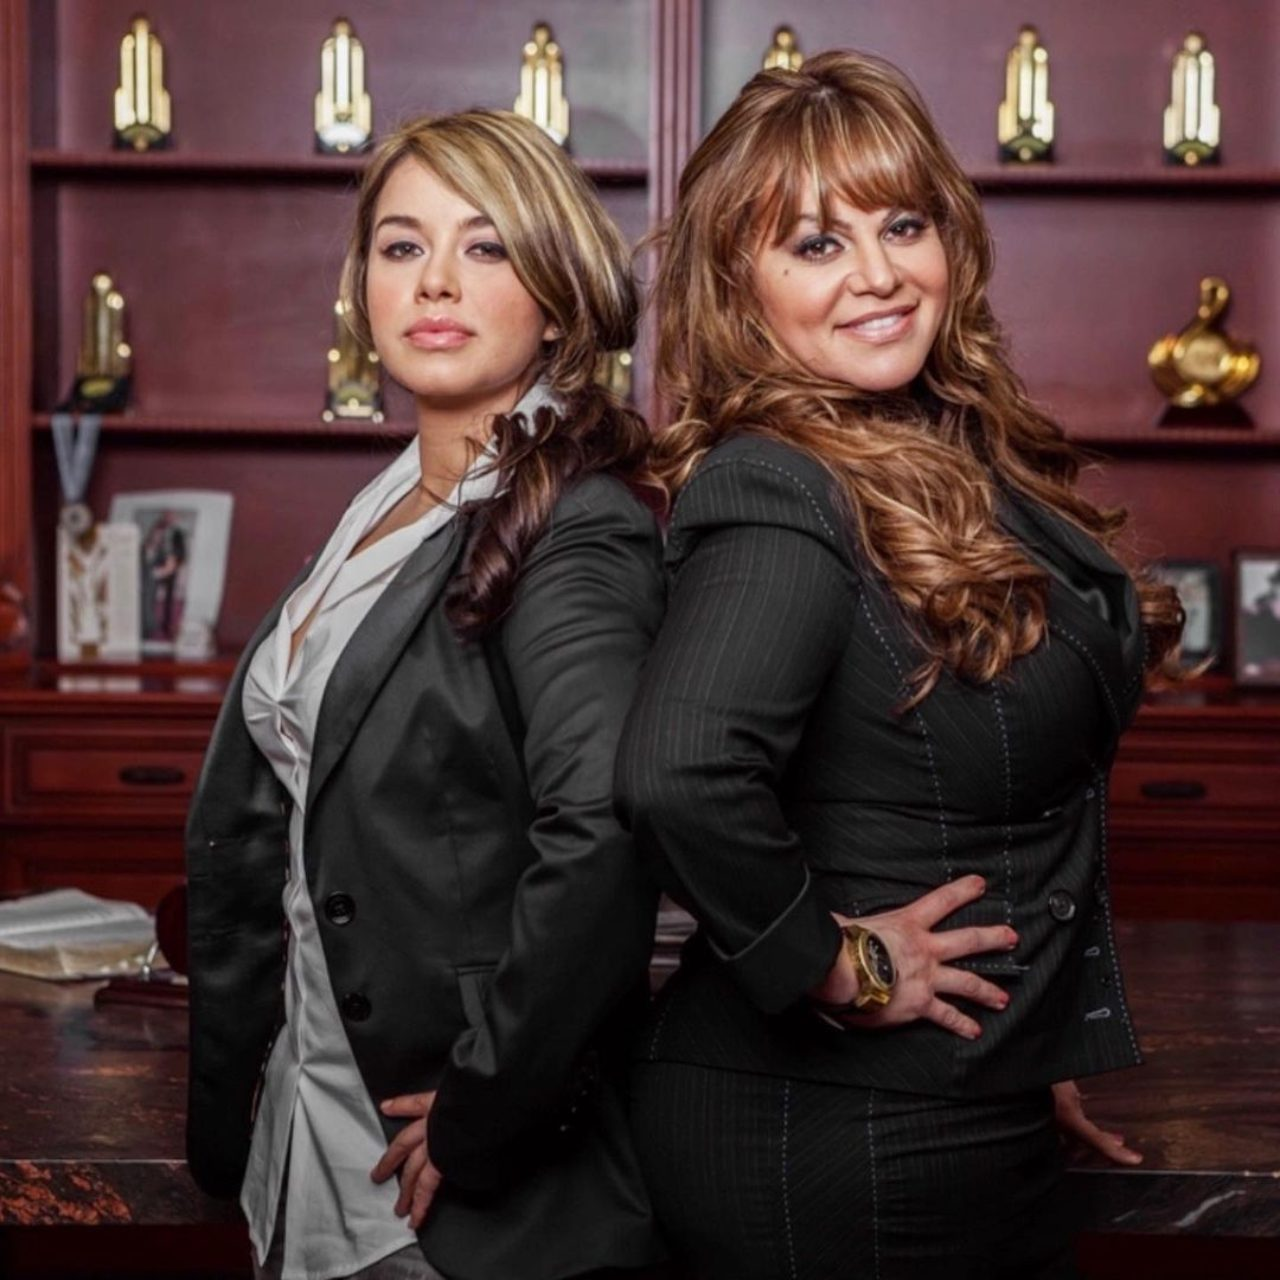 Chiquis Rivera y Jenni Rivera juntas